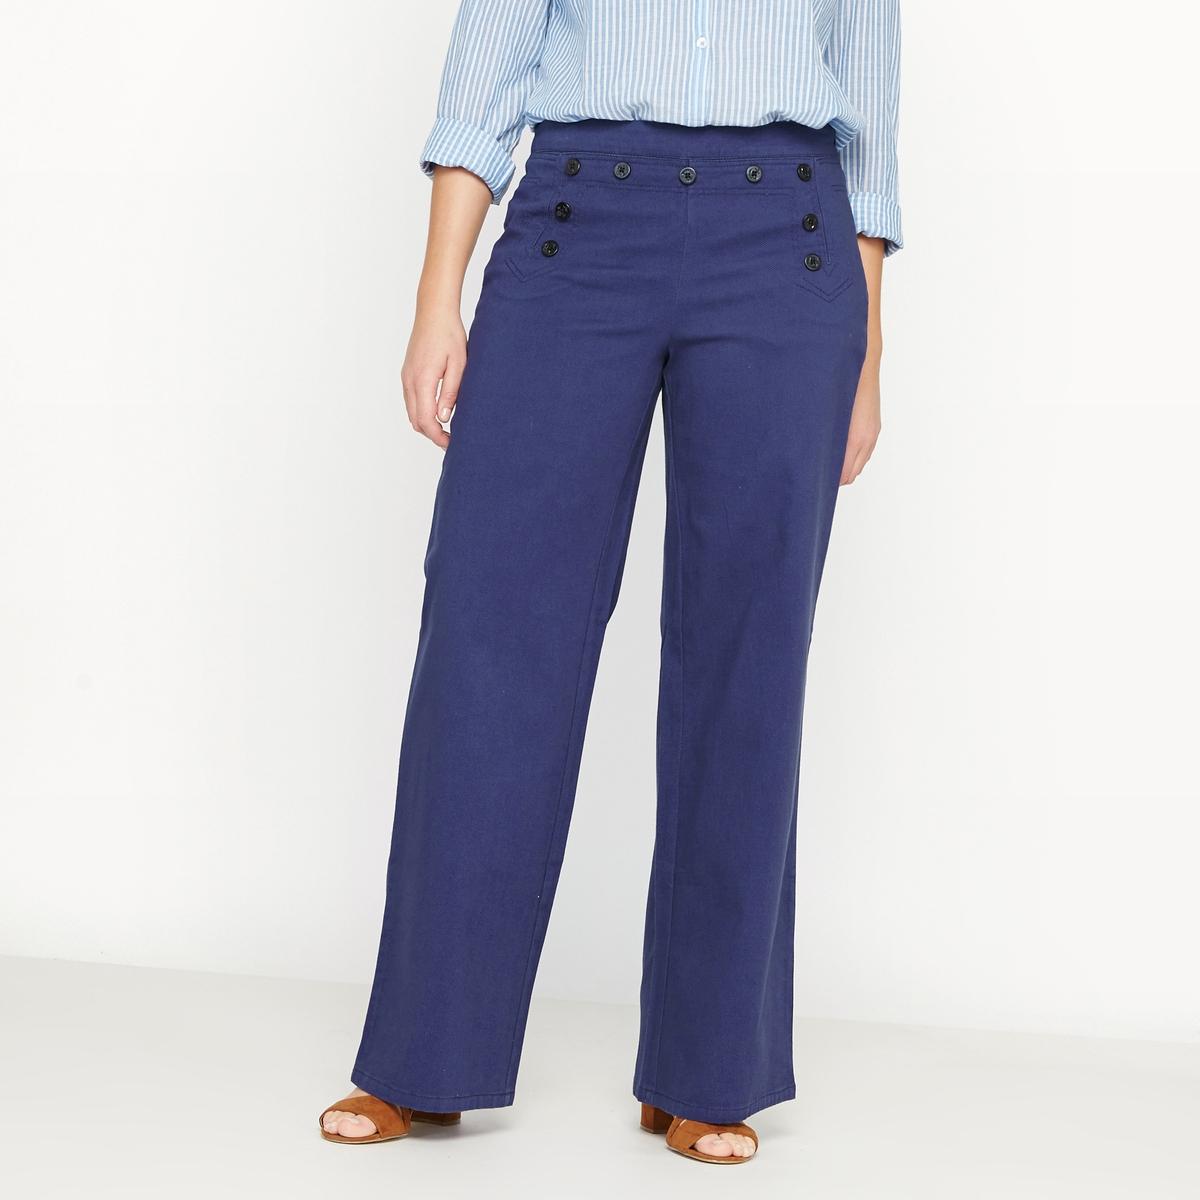 Брюки широкие из трикотажа брюки широкие из хлопка stretch phil